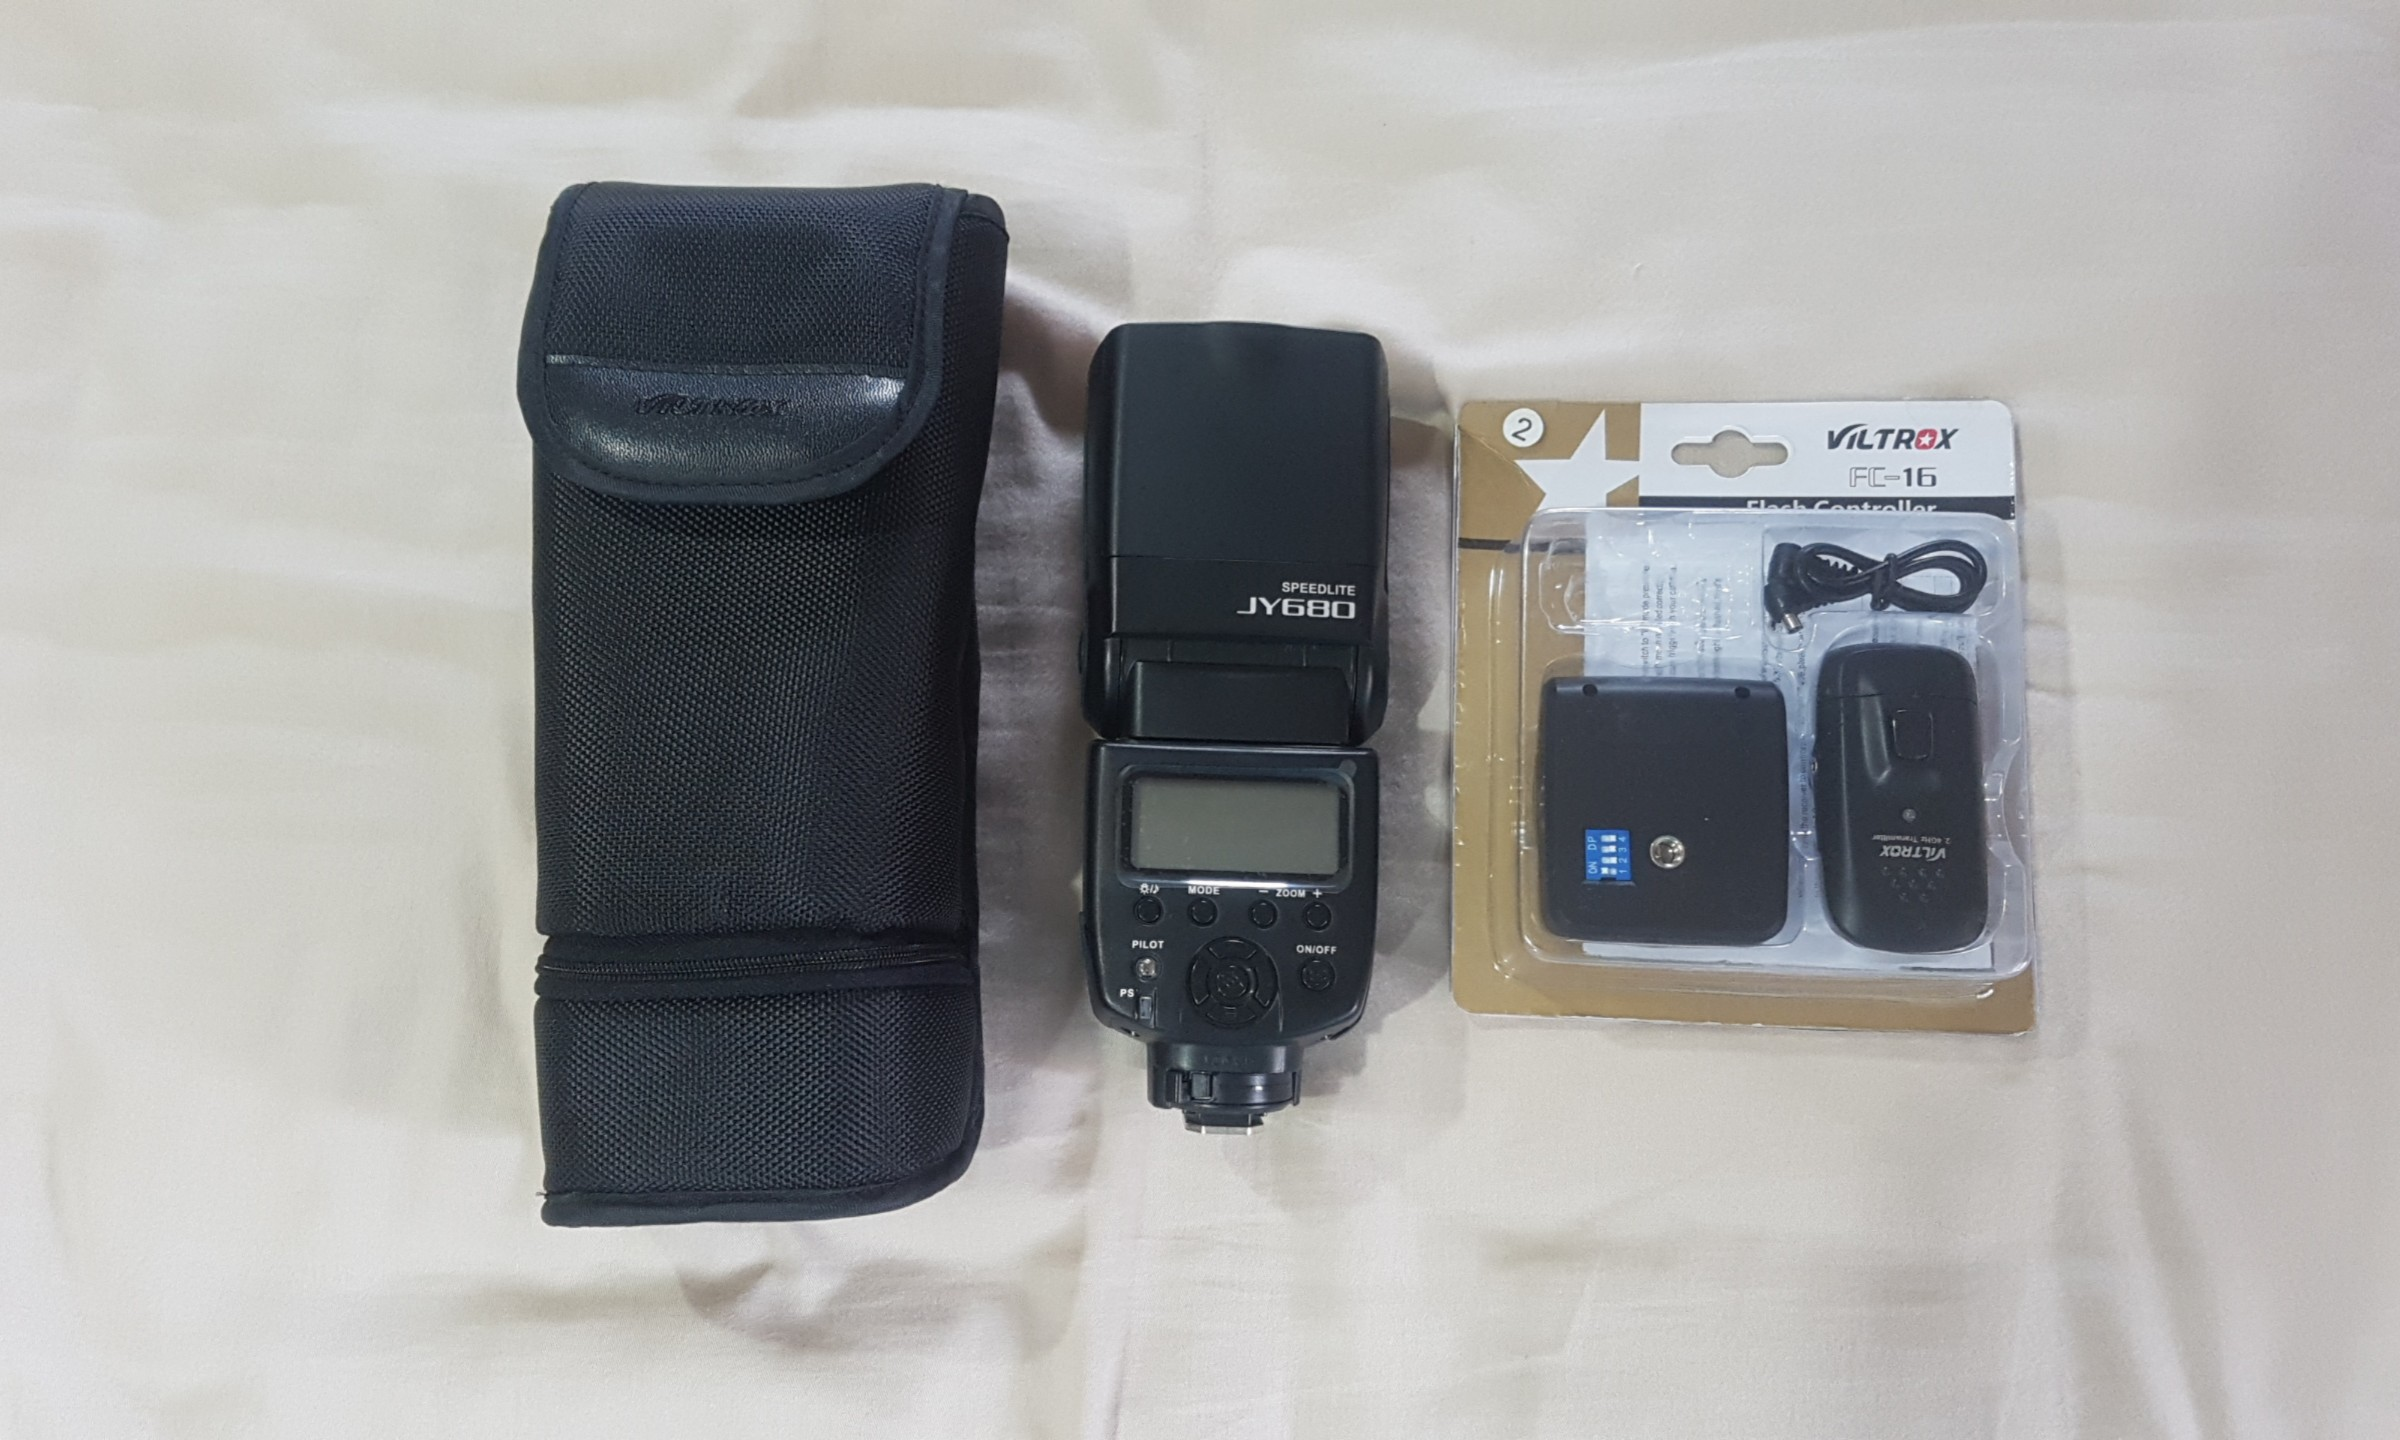 Promo Harga Canon Eos 750d Kit Ef S 18 135mm Is Stm Kamera Dslr P Pavilion 14 Al168tx Notebook Silver I5 7200u 4gb 1tb 14ampquot Win 10 Mcafee 70d 55mm 55 250mm Lenses